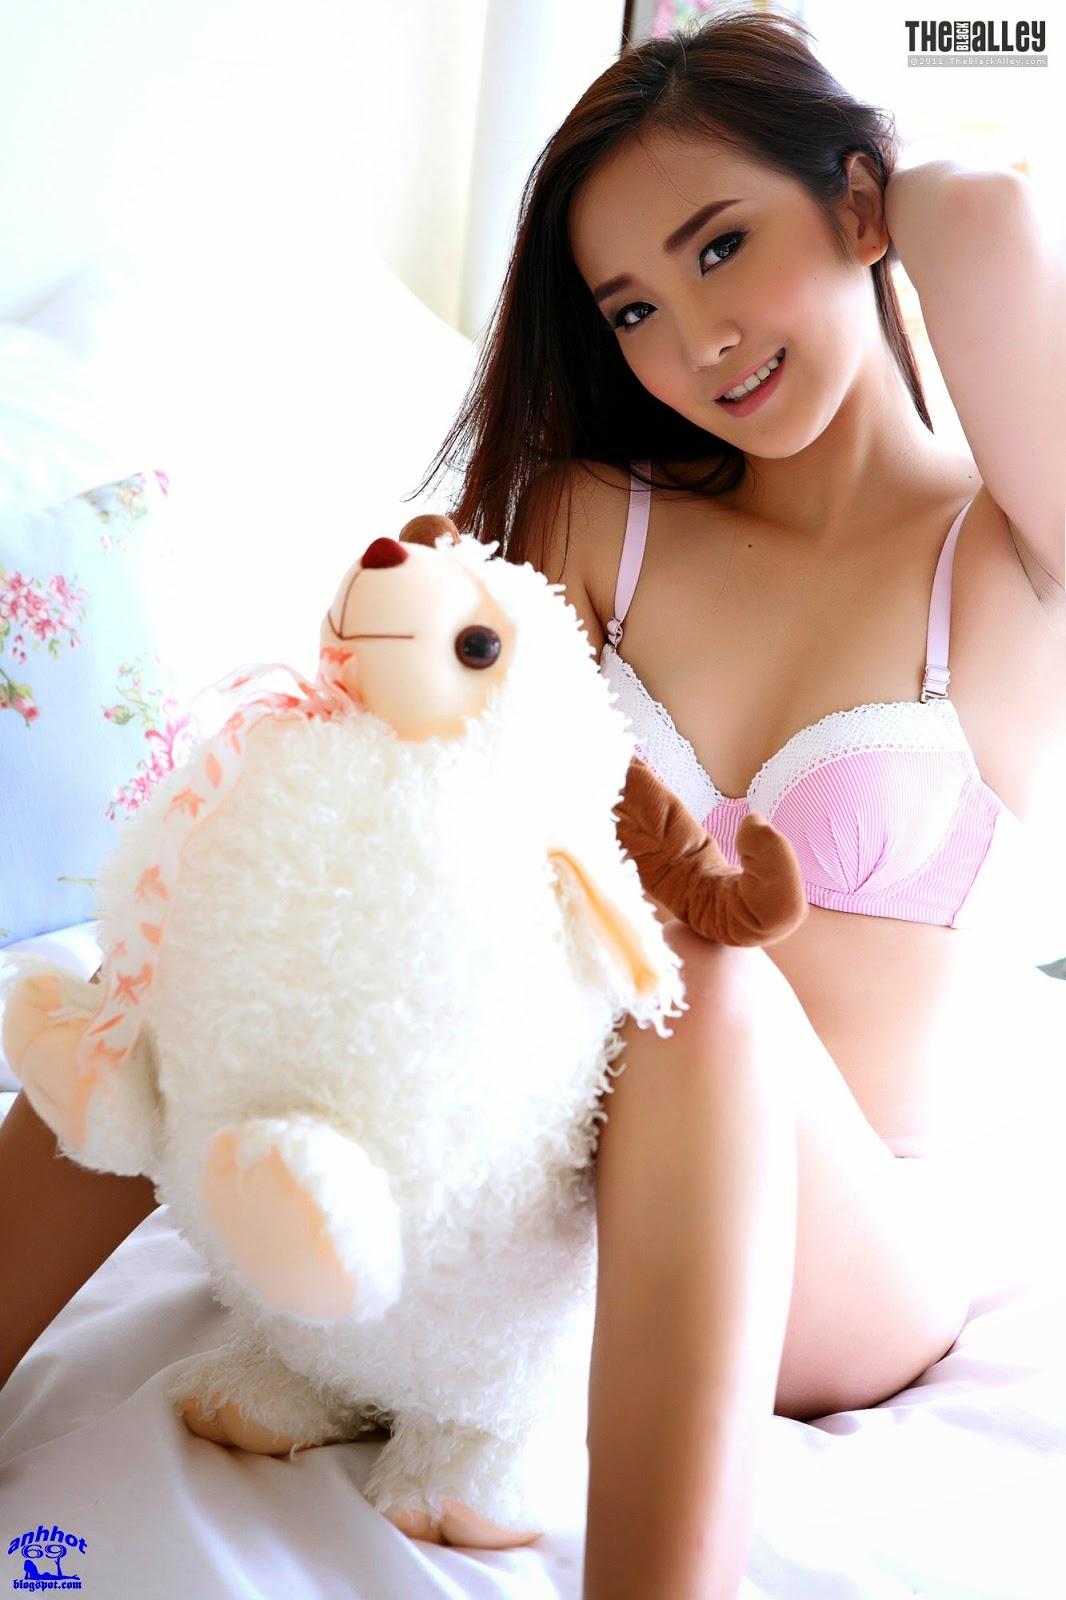 lolita-cheng-64-028